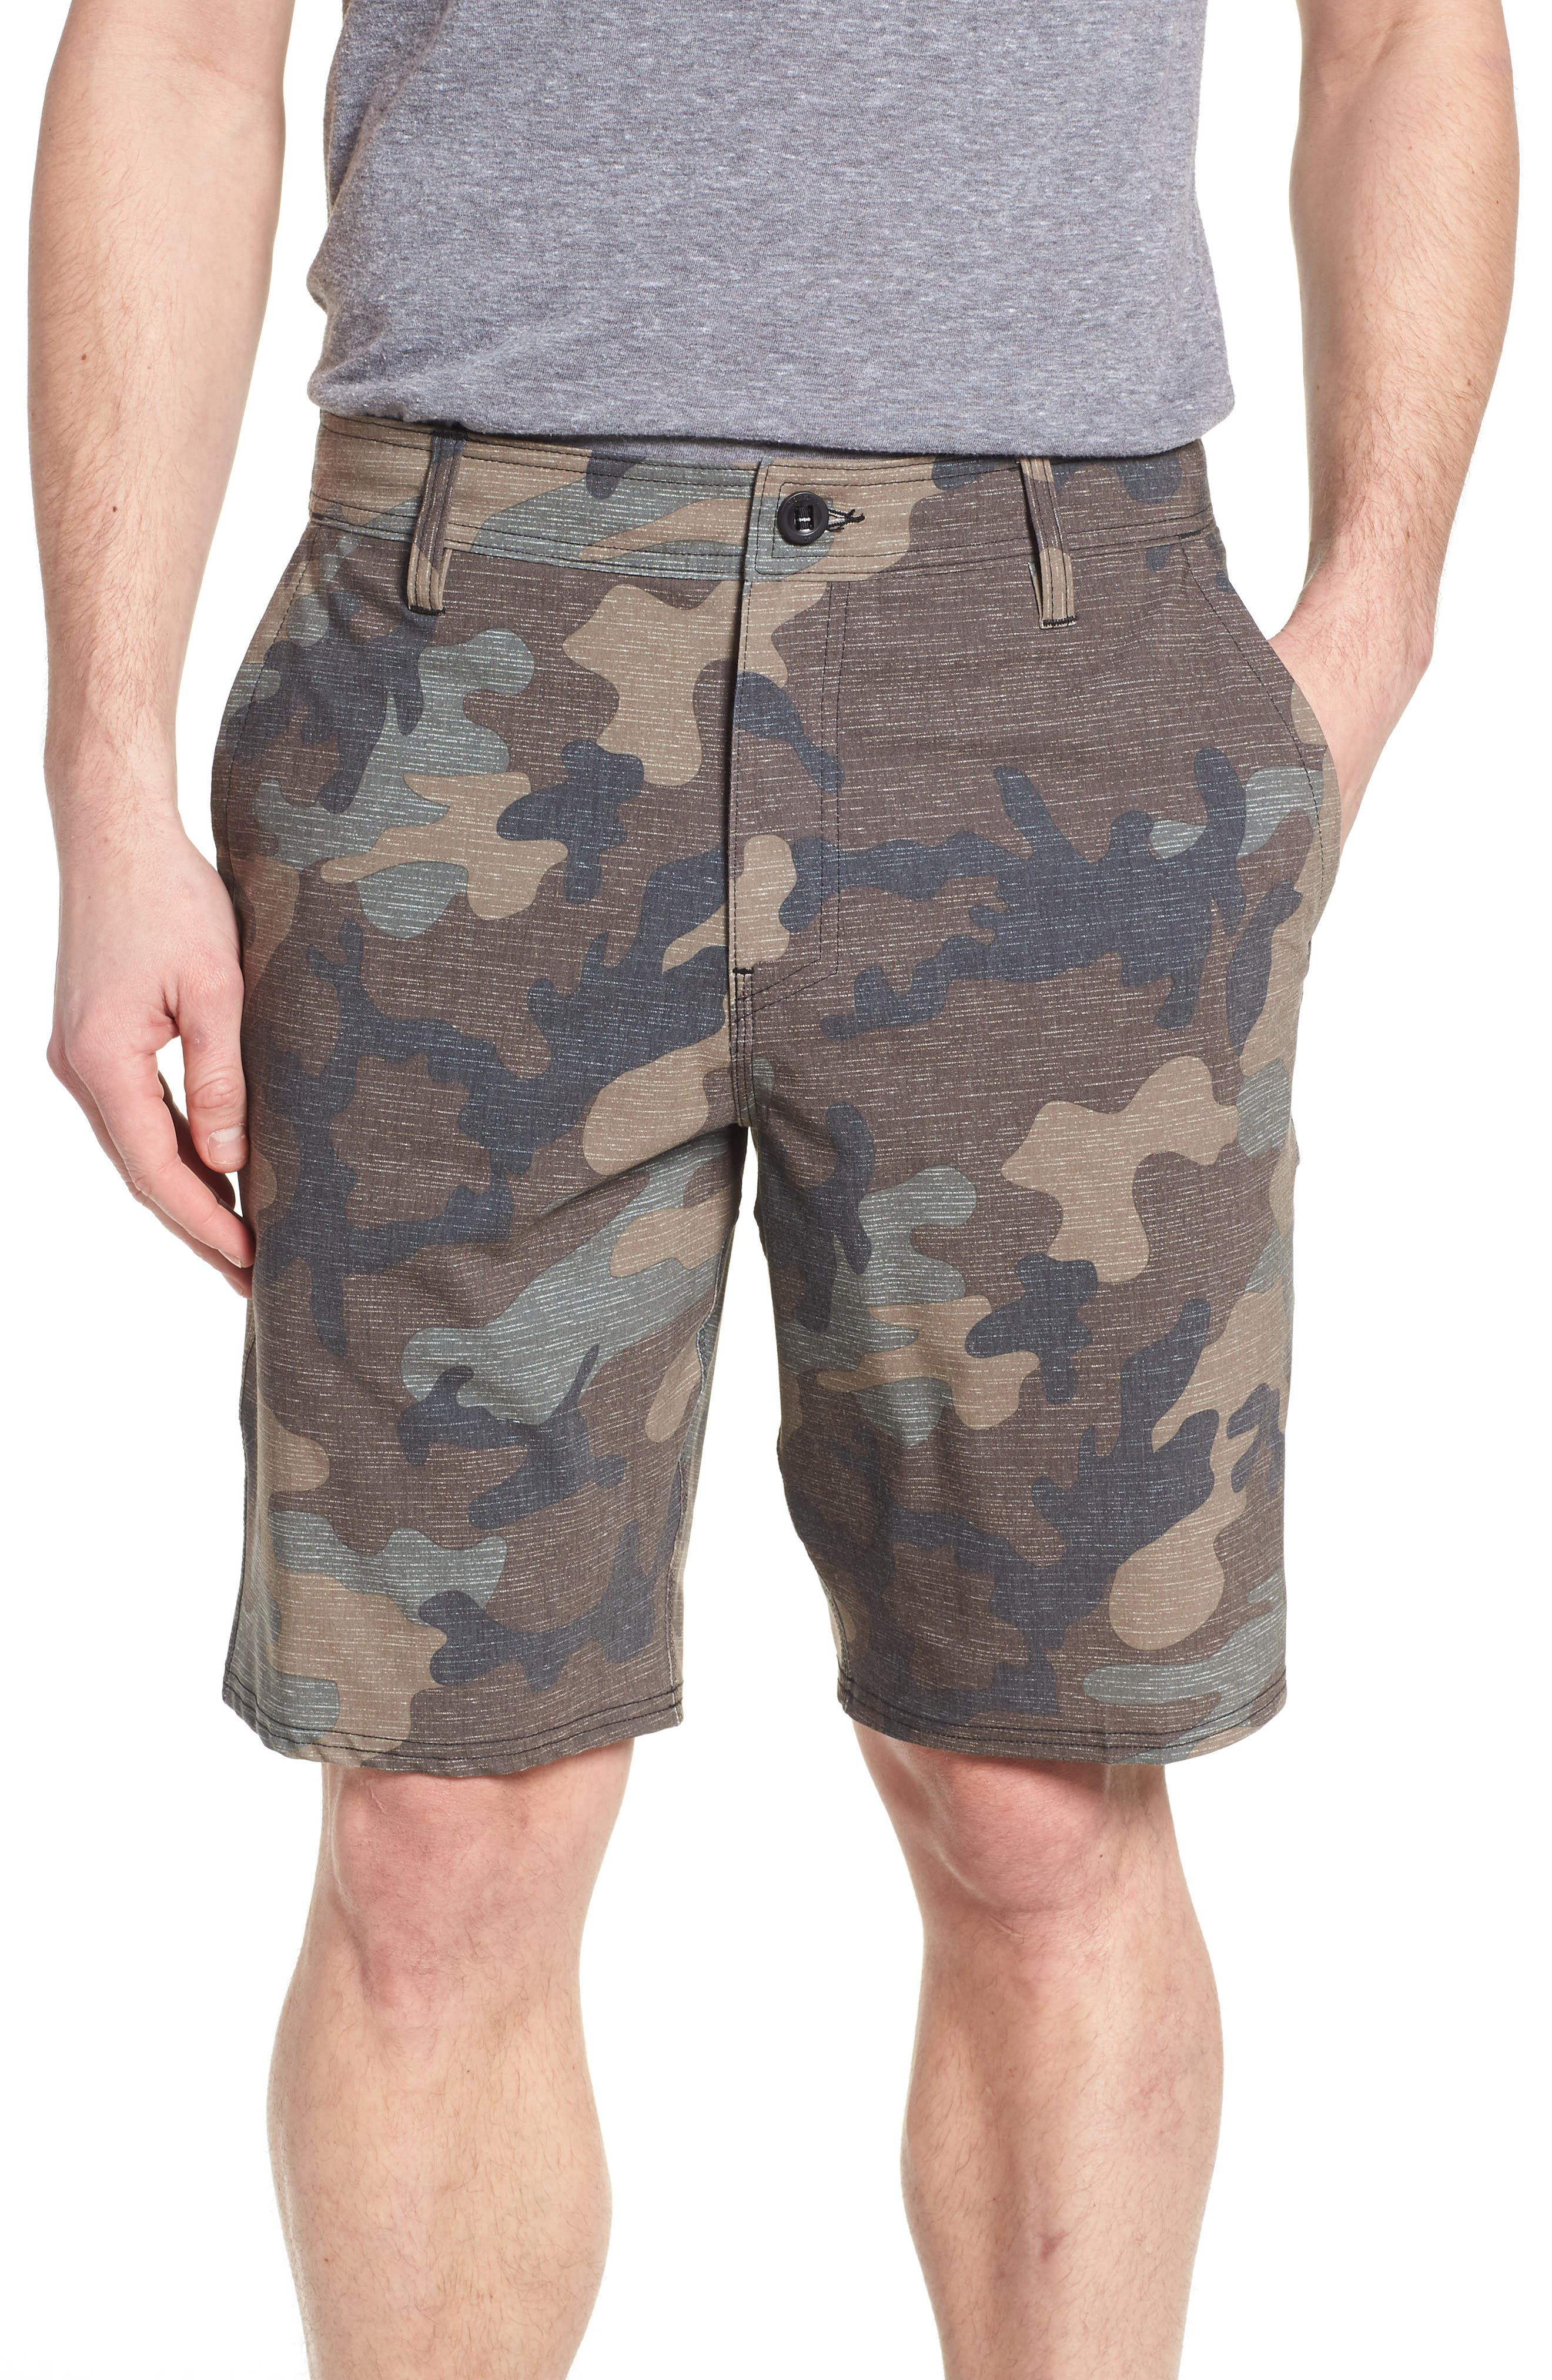 Mixed Hybrid Shorts,                             Main thumbnail 1, color,                             Camo